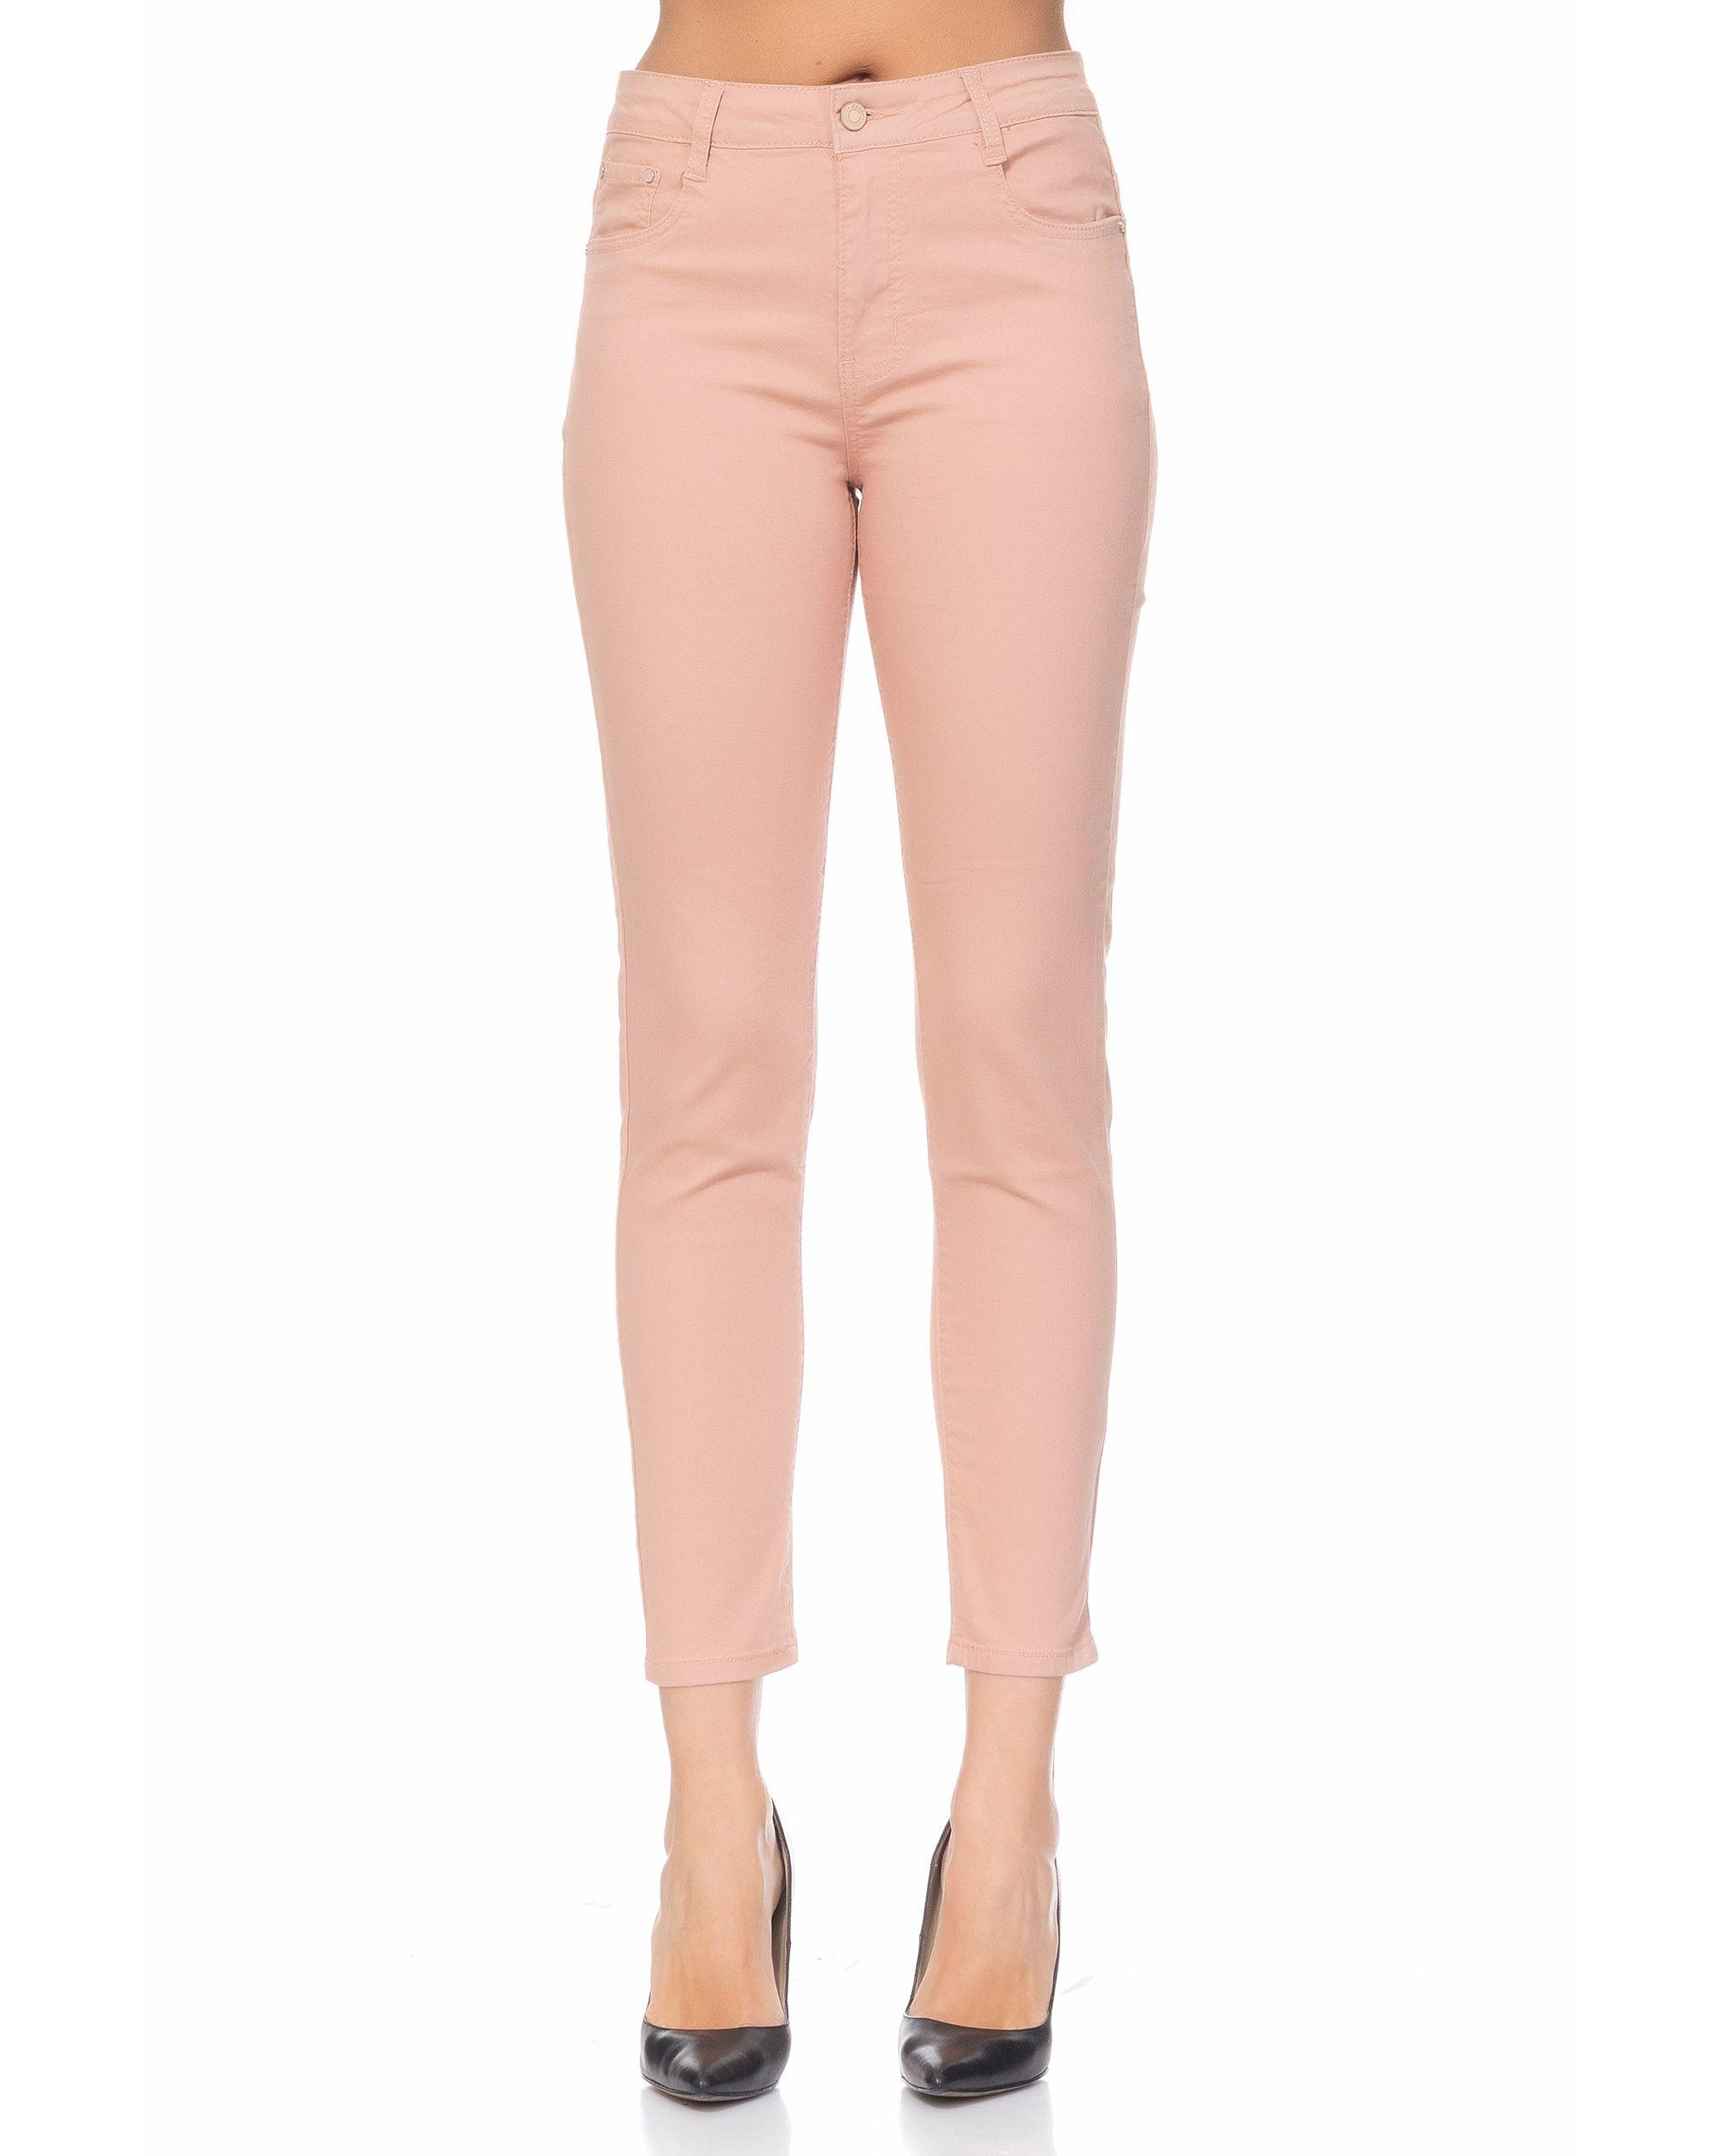 Five Pockets Slim Fit Jeans